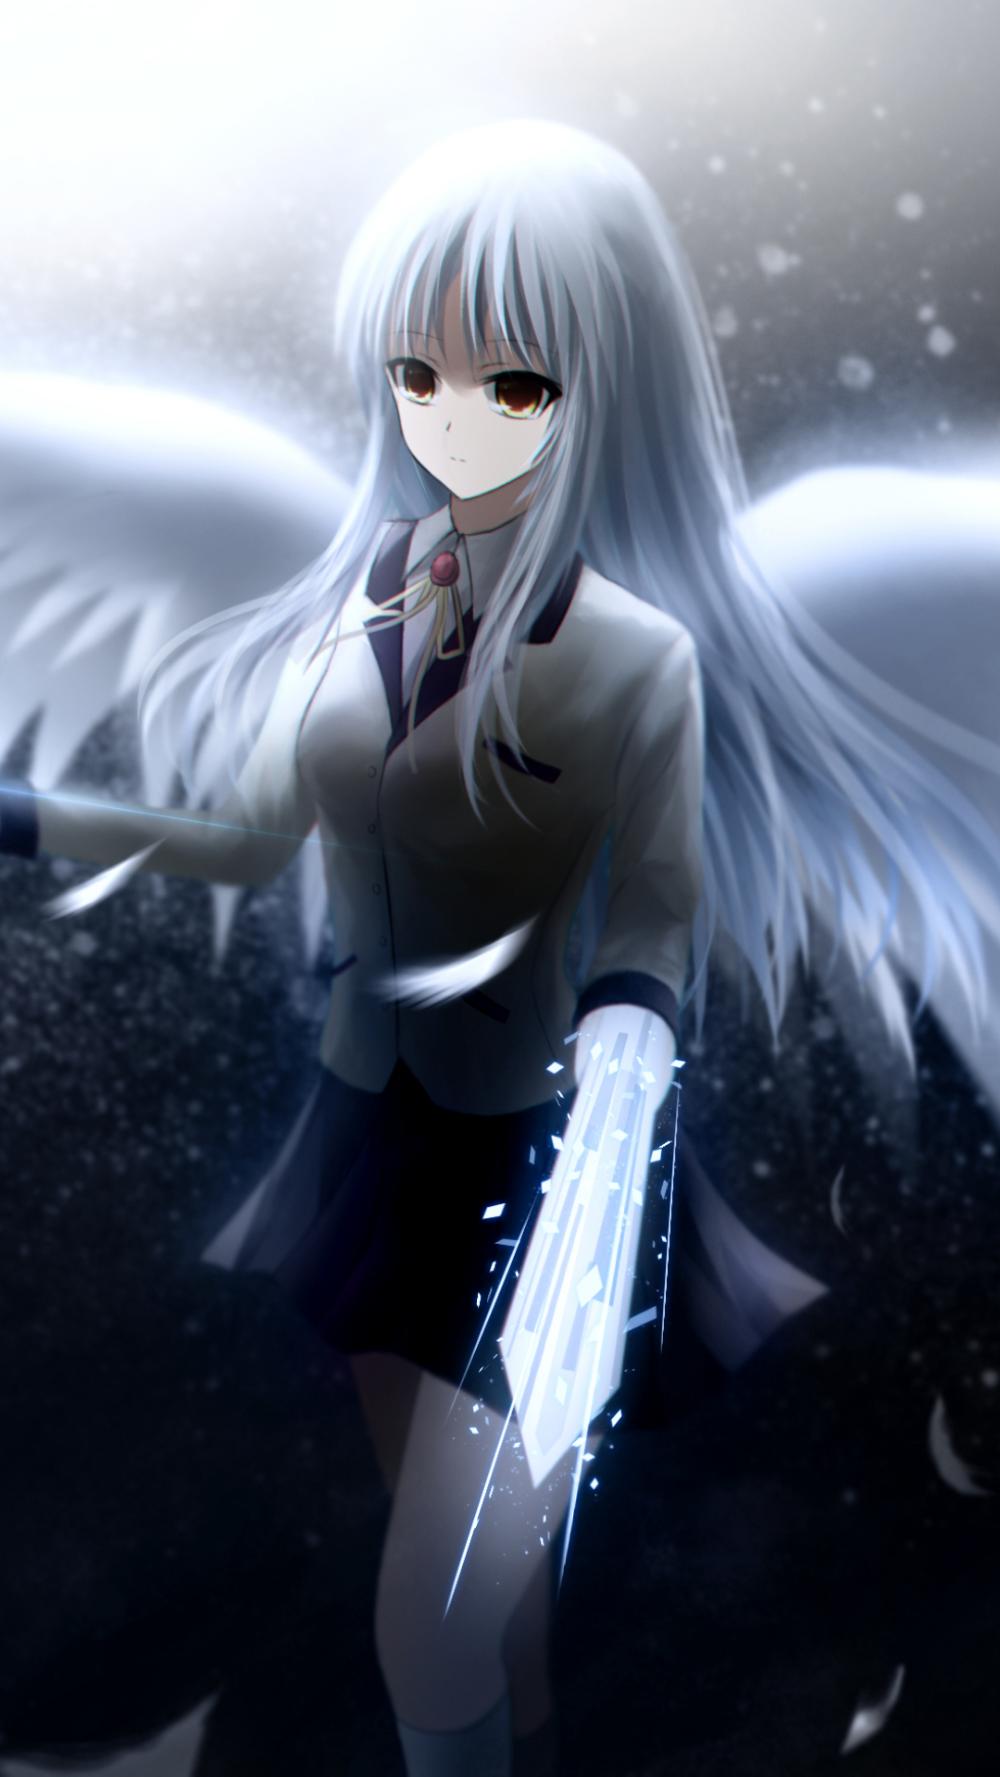 Anime Angel Beats Kanade Tachibana 1080x1920 Mobile Wallpaper